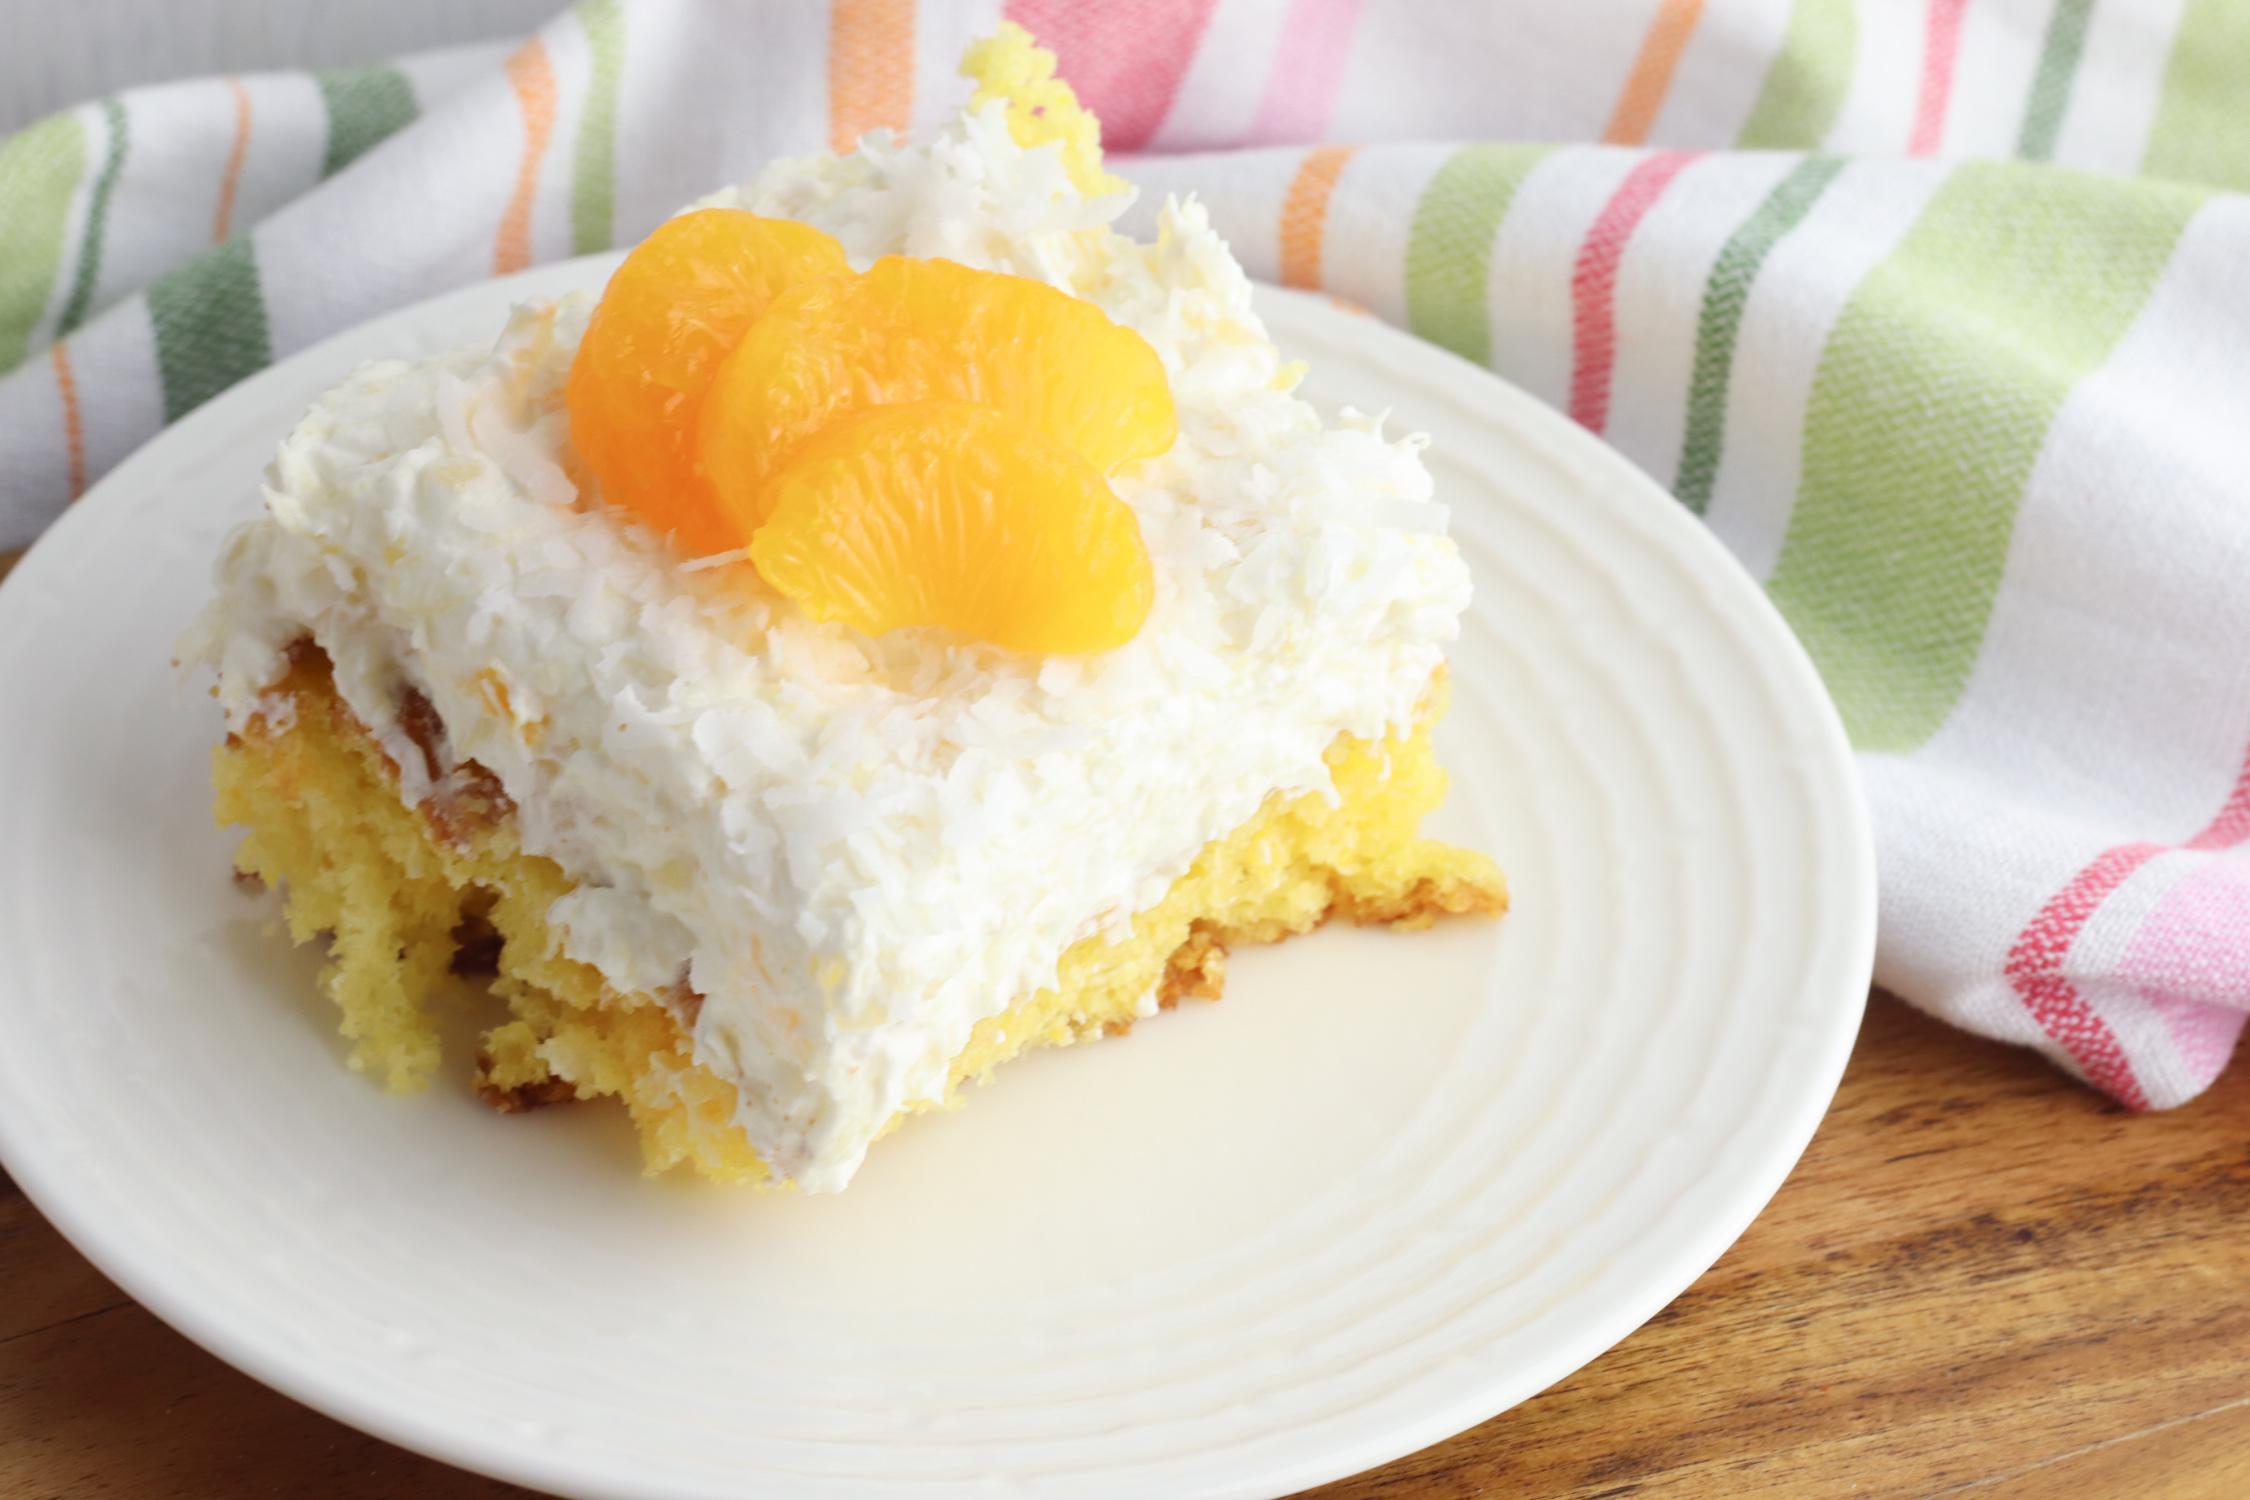 Orange Pineapple Cake being served for dessert.